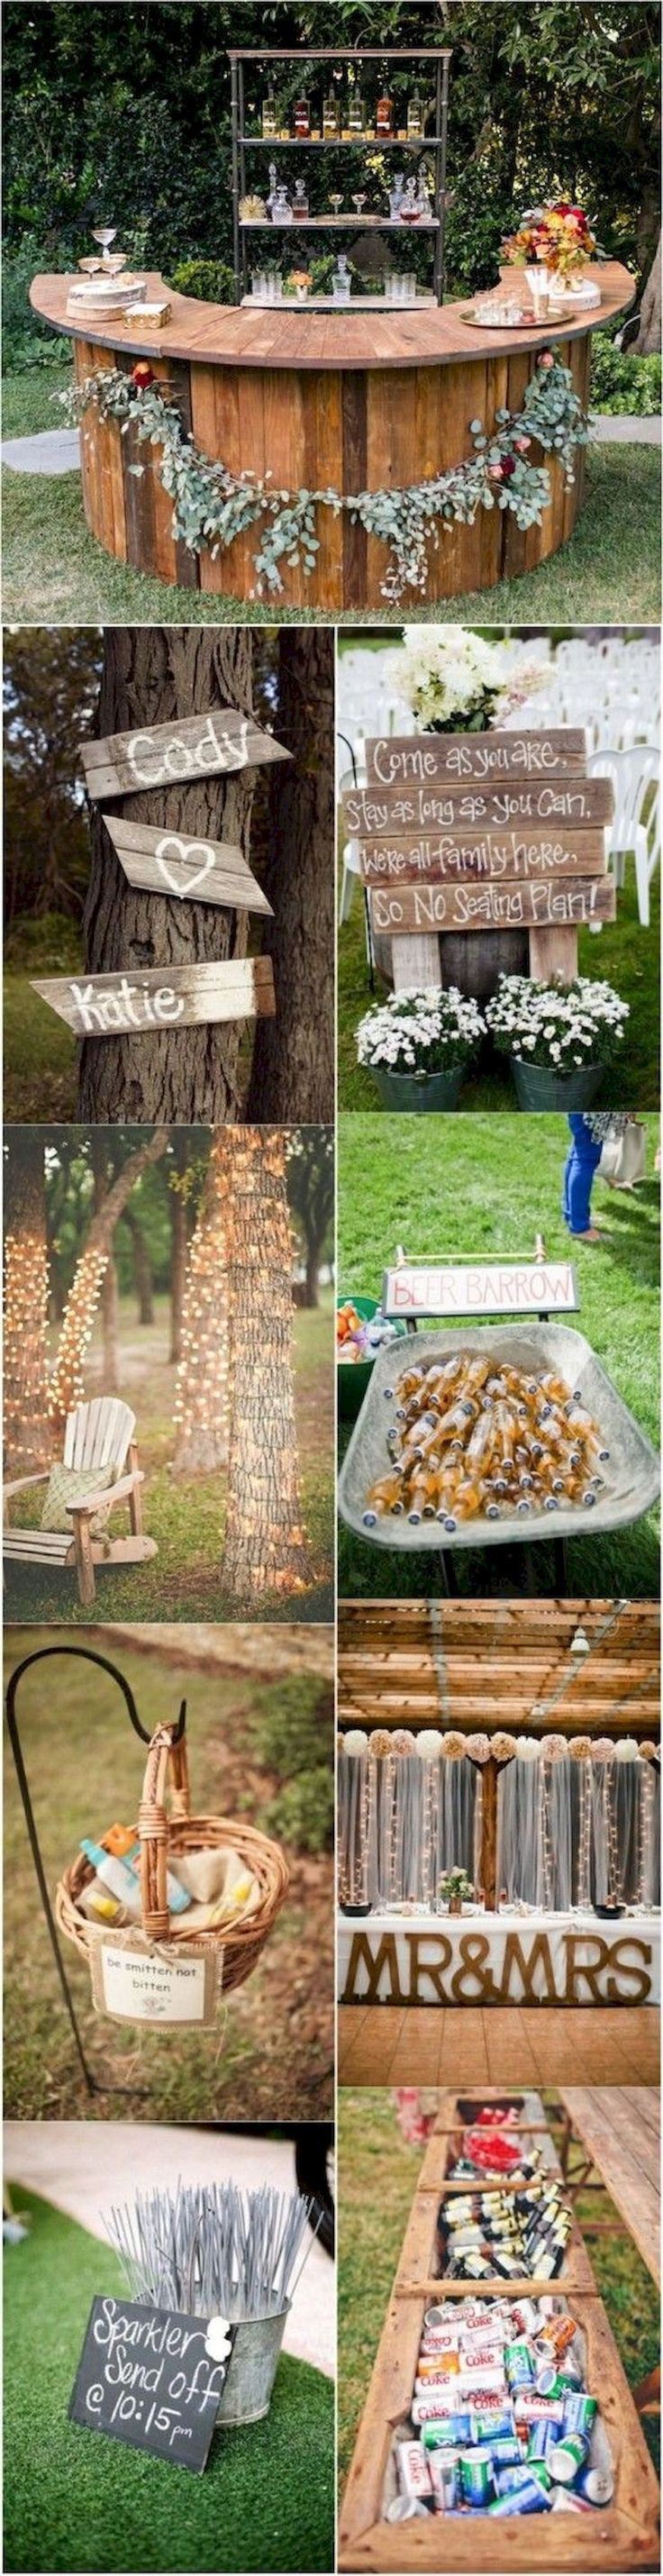 Elegant outdoor wedding decor ideas on a budget (19) #outdoorweddingdecorations #budgetwedding